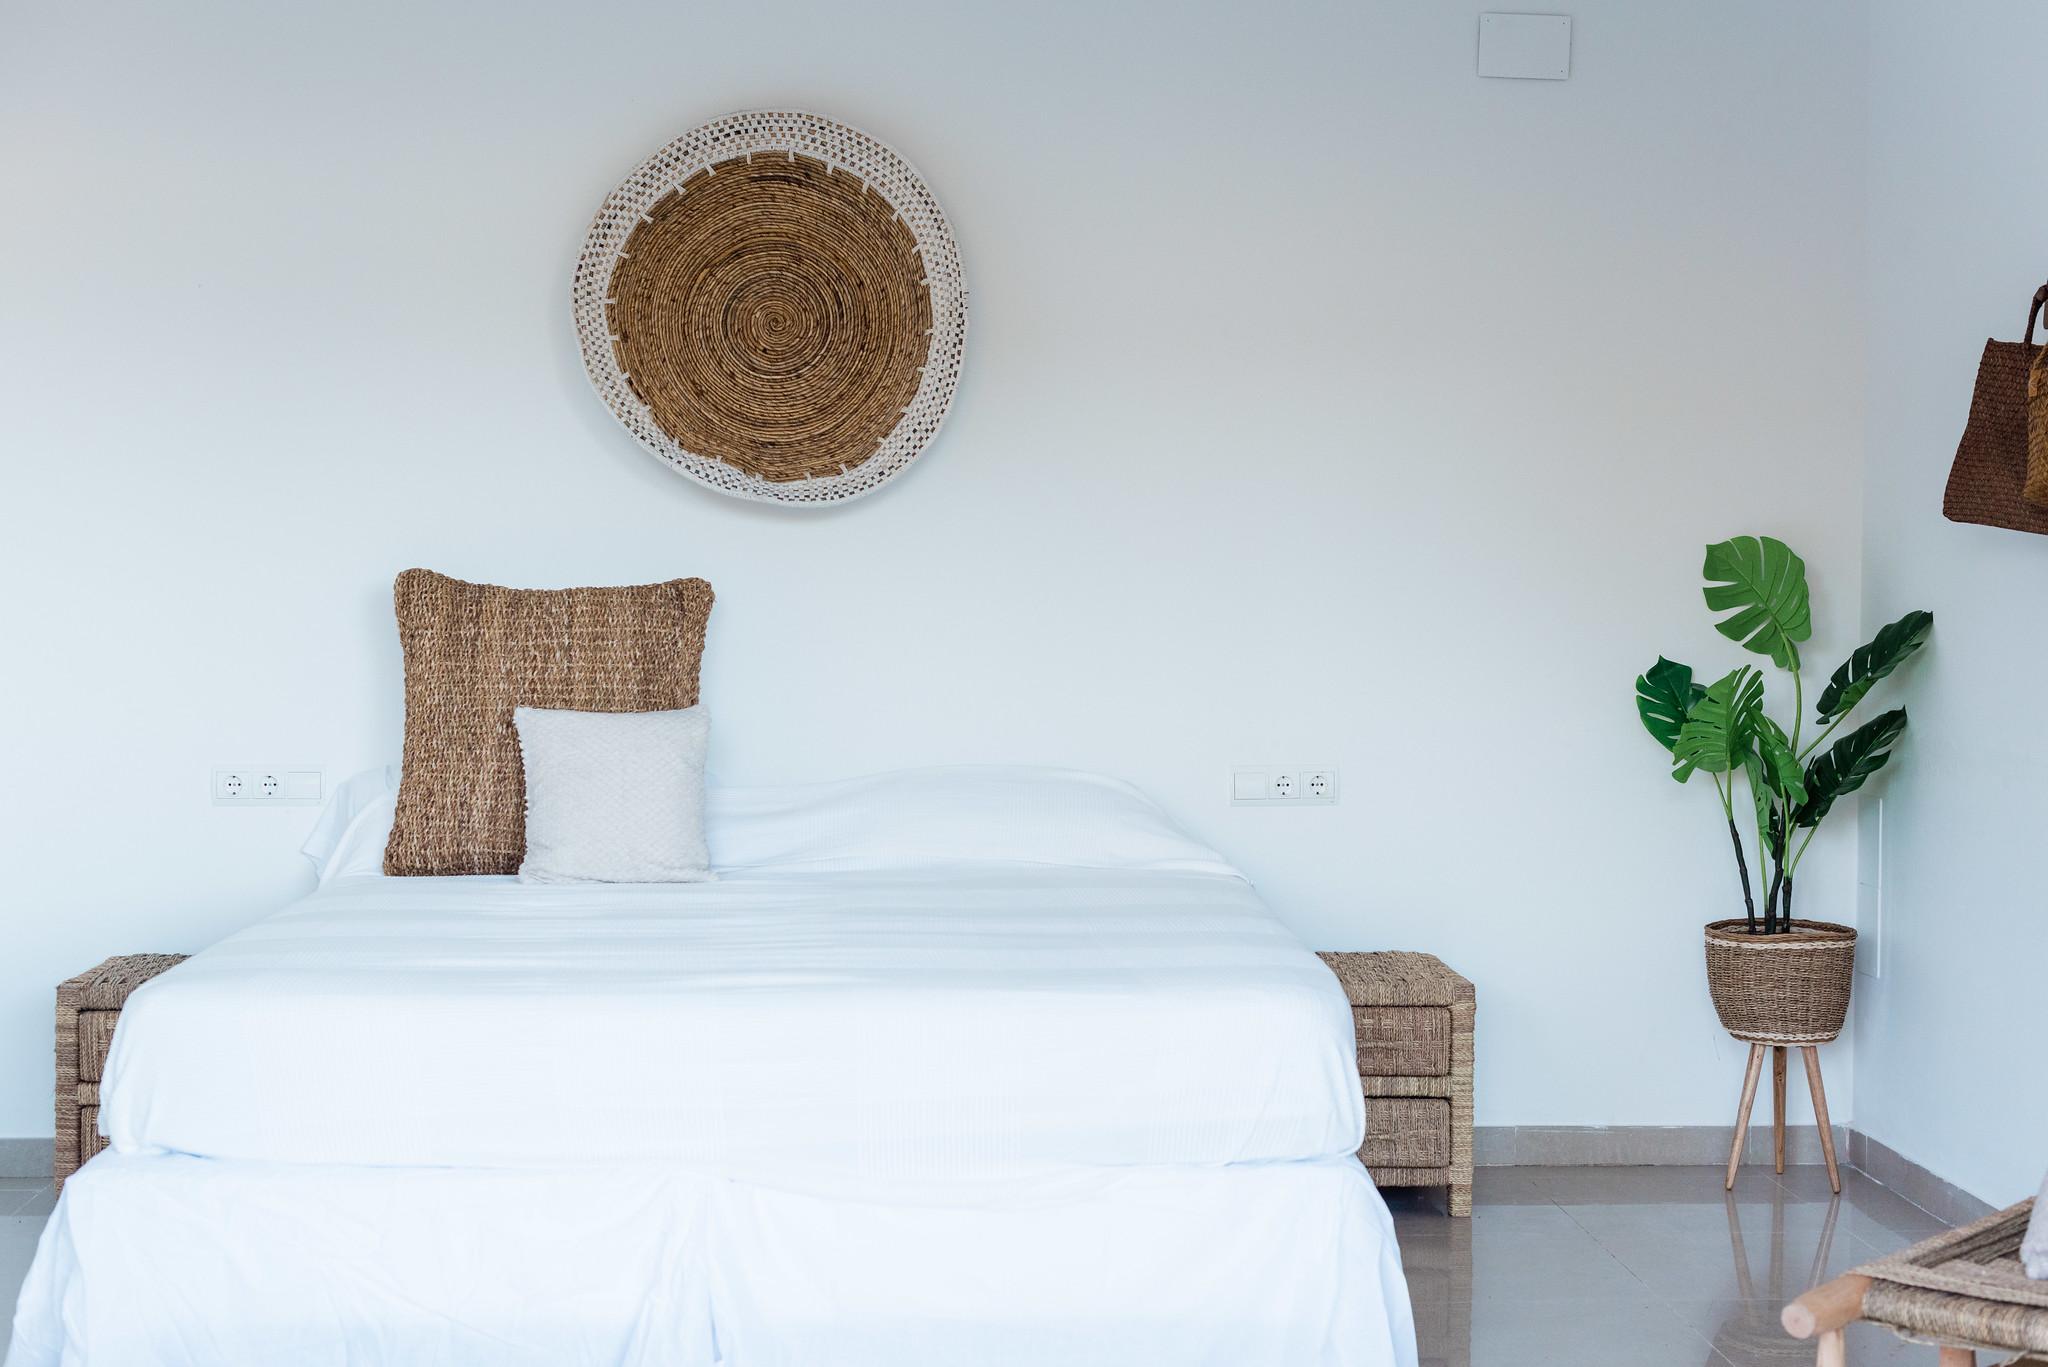 https://www.white-ibiza.com/wp-content/uploads/2020/05/white-ibiza-villas-can-verde-interior-casita.jpg